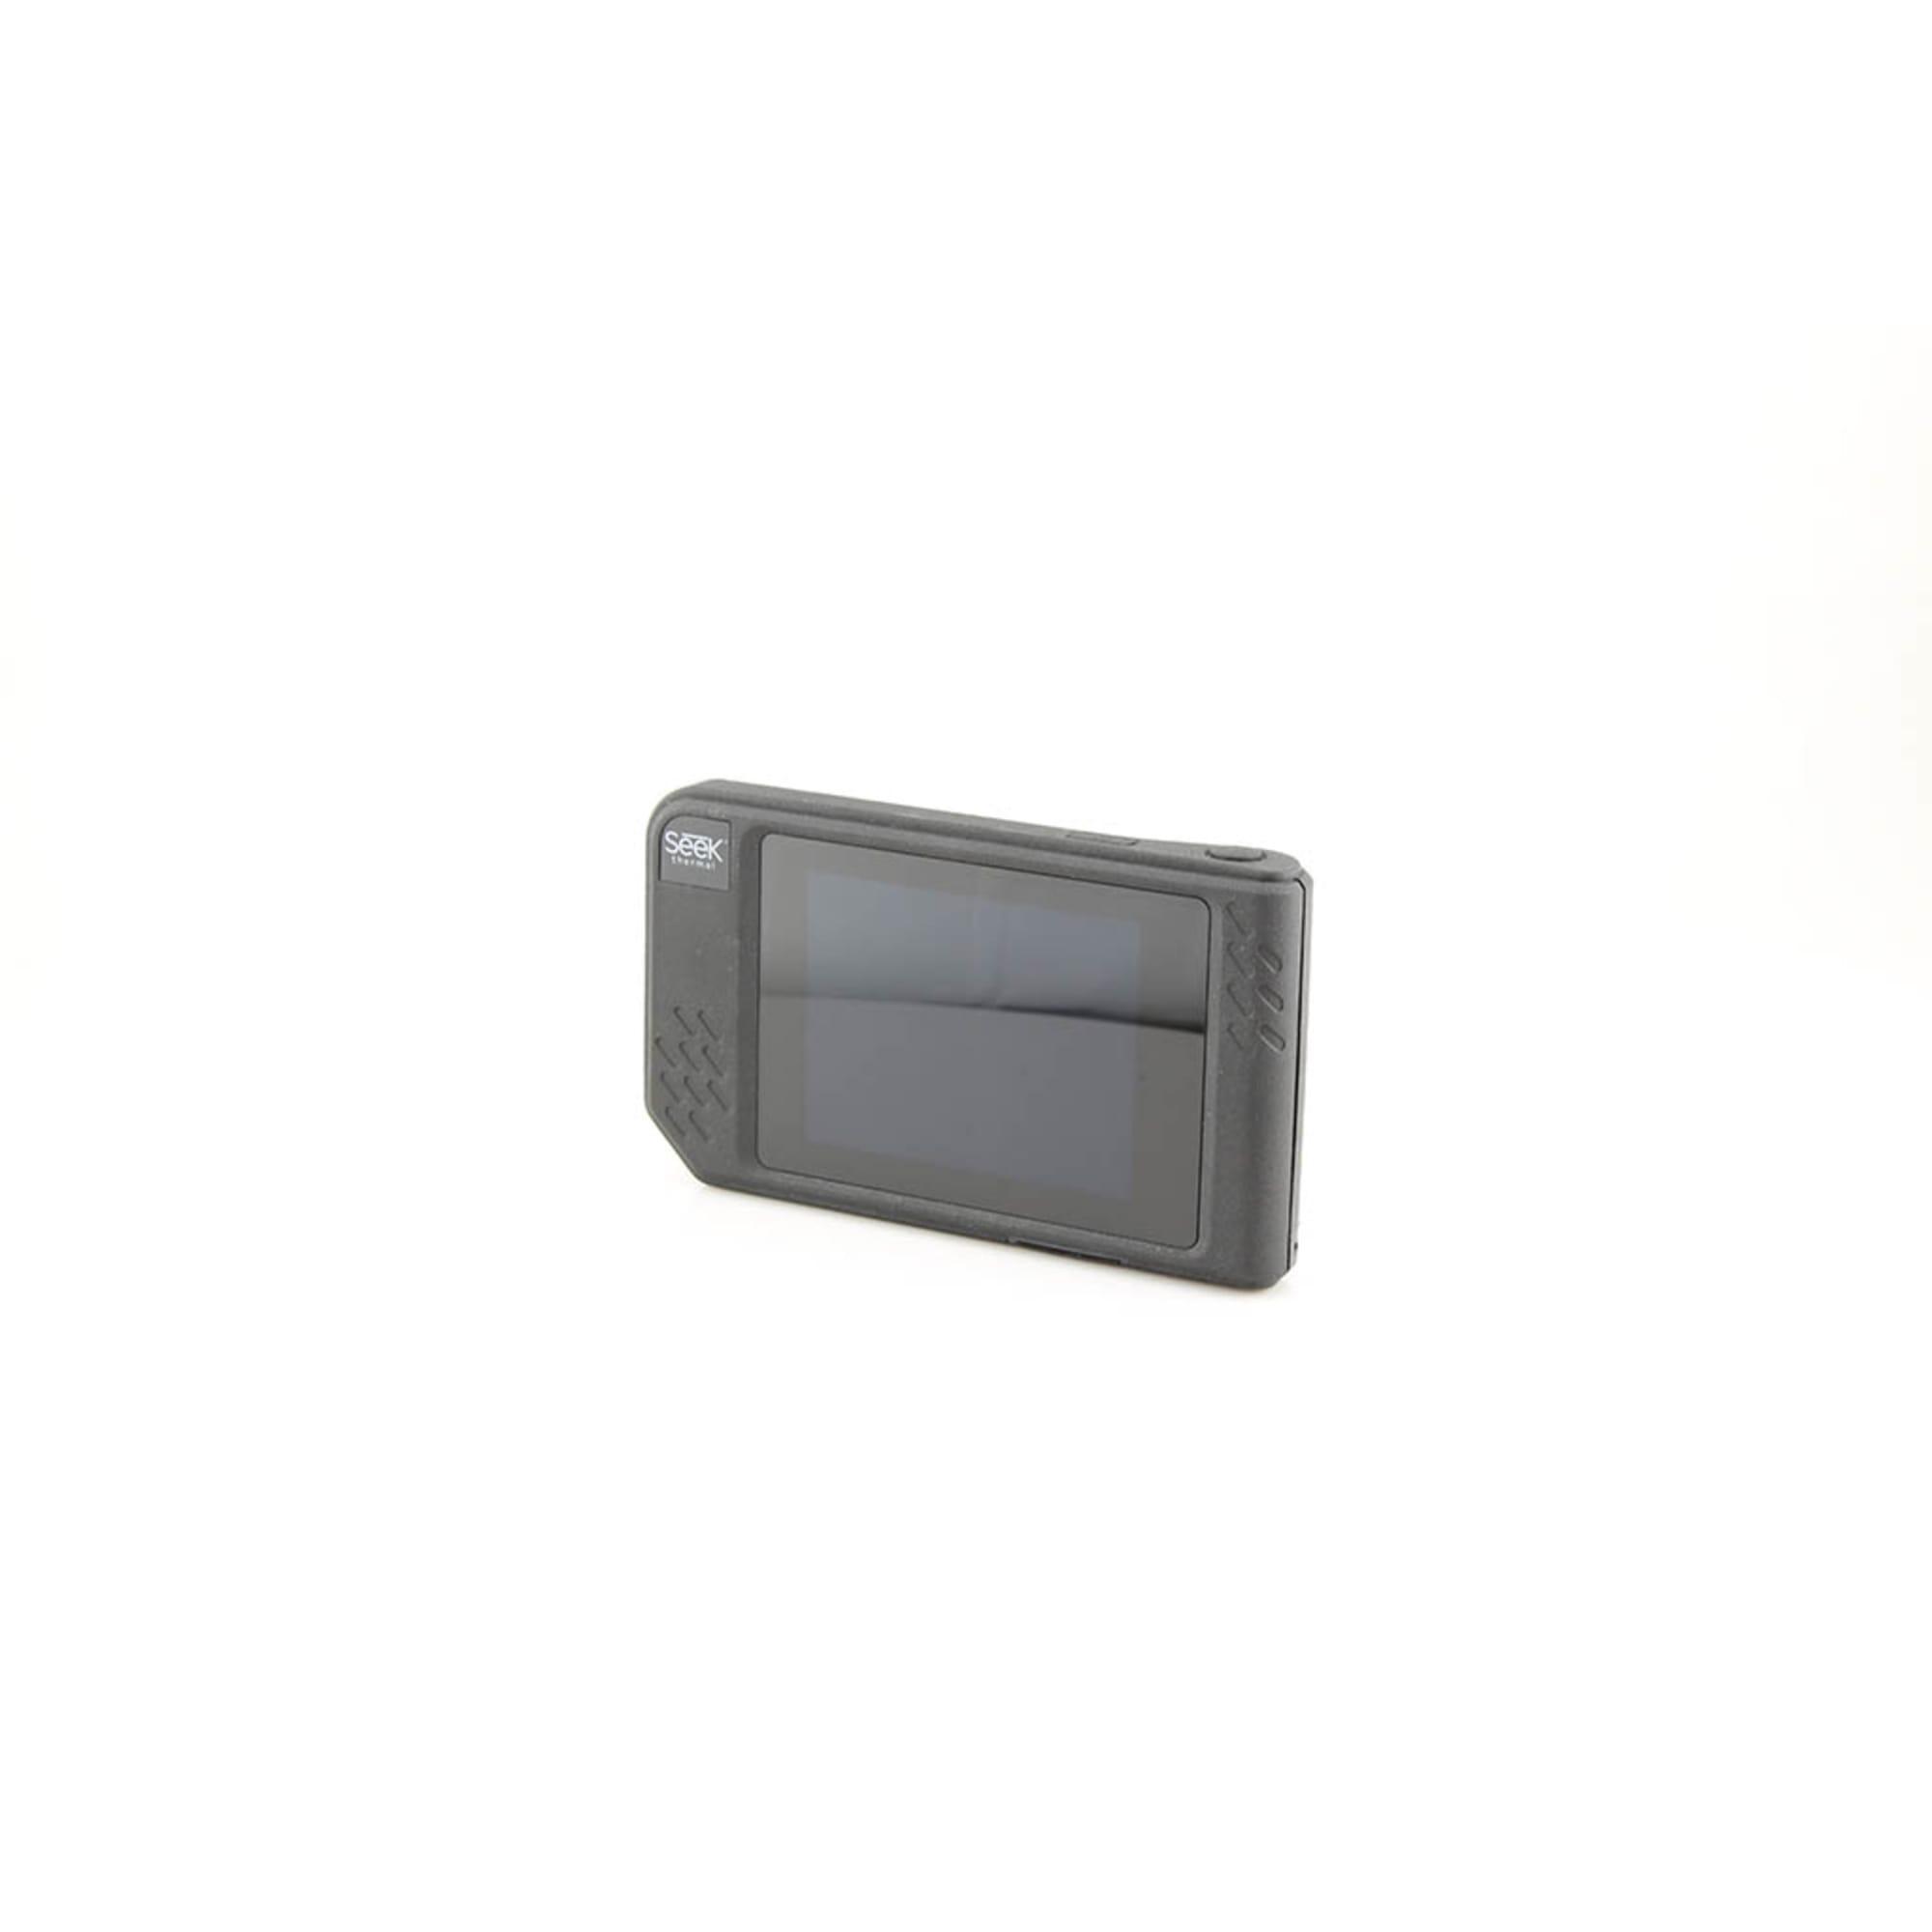 Seek Thermal Shotpro Infrared Camera Tequipment